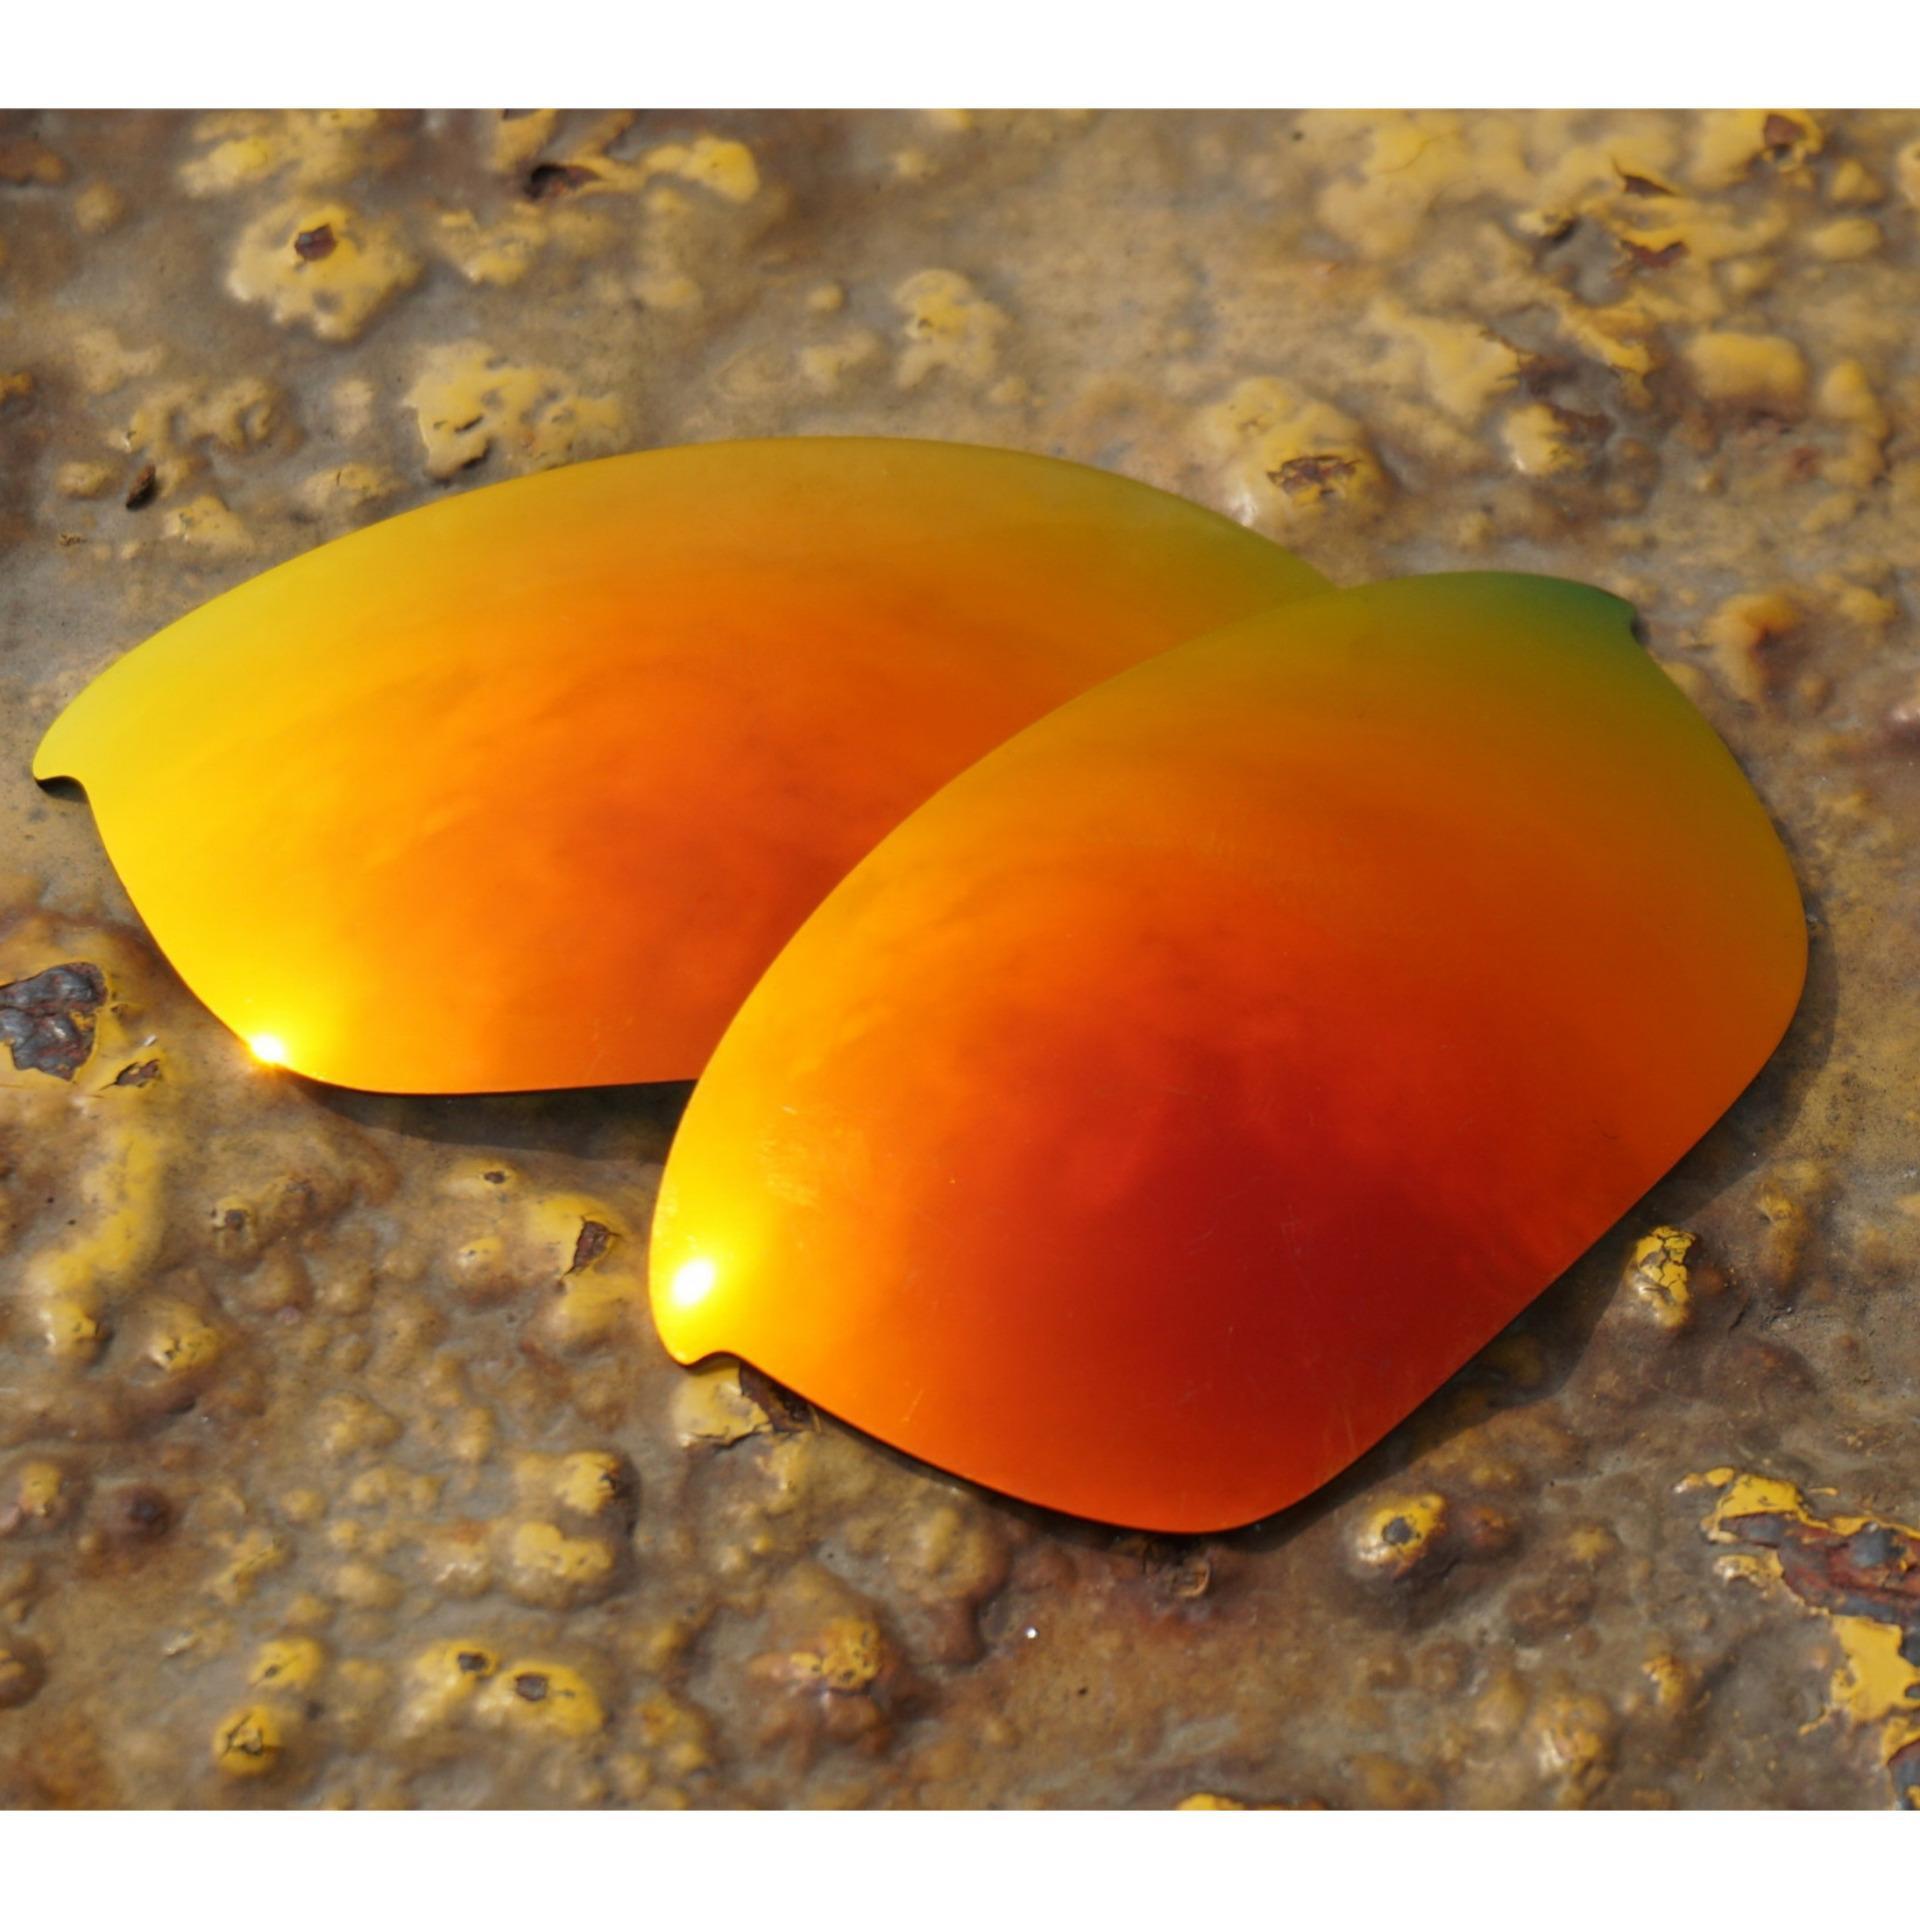 Bottle-Feed Penggantian Lensa untuk Setengah Jaket 2.0 Kacamata Terpolarisasi Api Merah-Intl